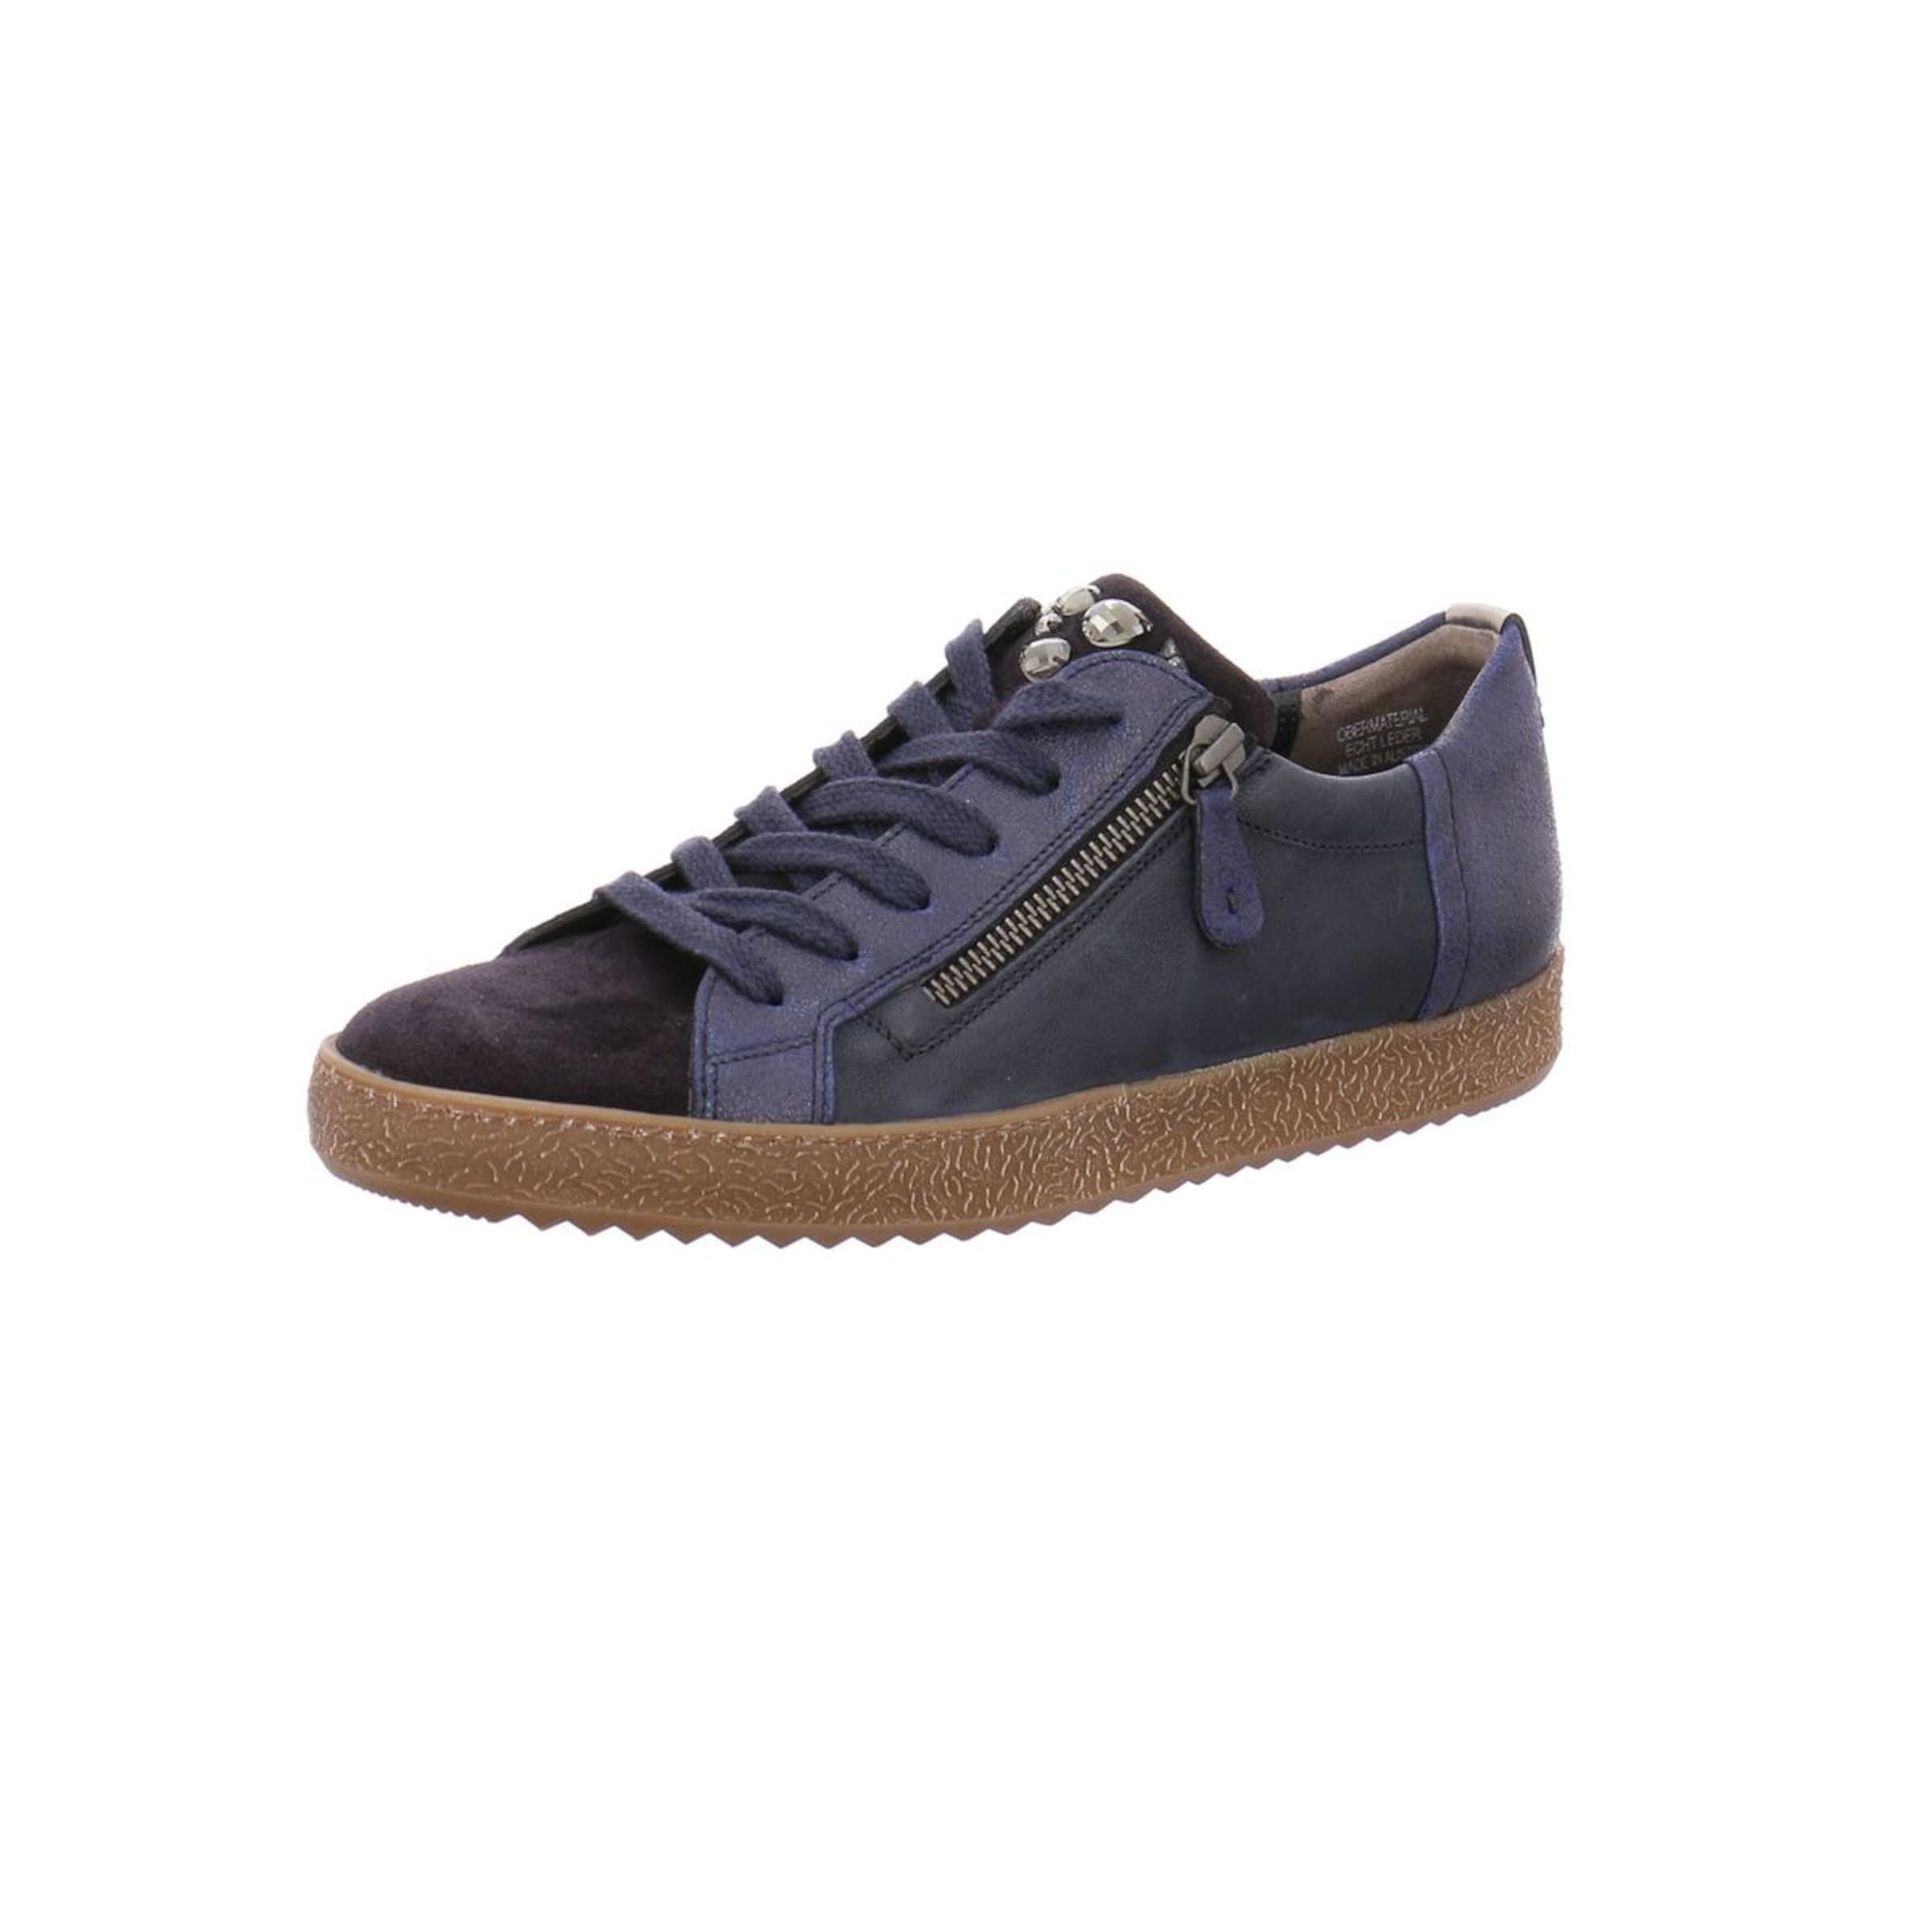 In Paul Rauchgrau Sneakers Silber TaubenblauDunkelblau Green nvO0yN8wm